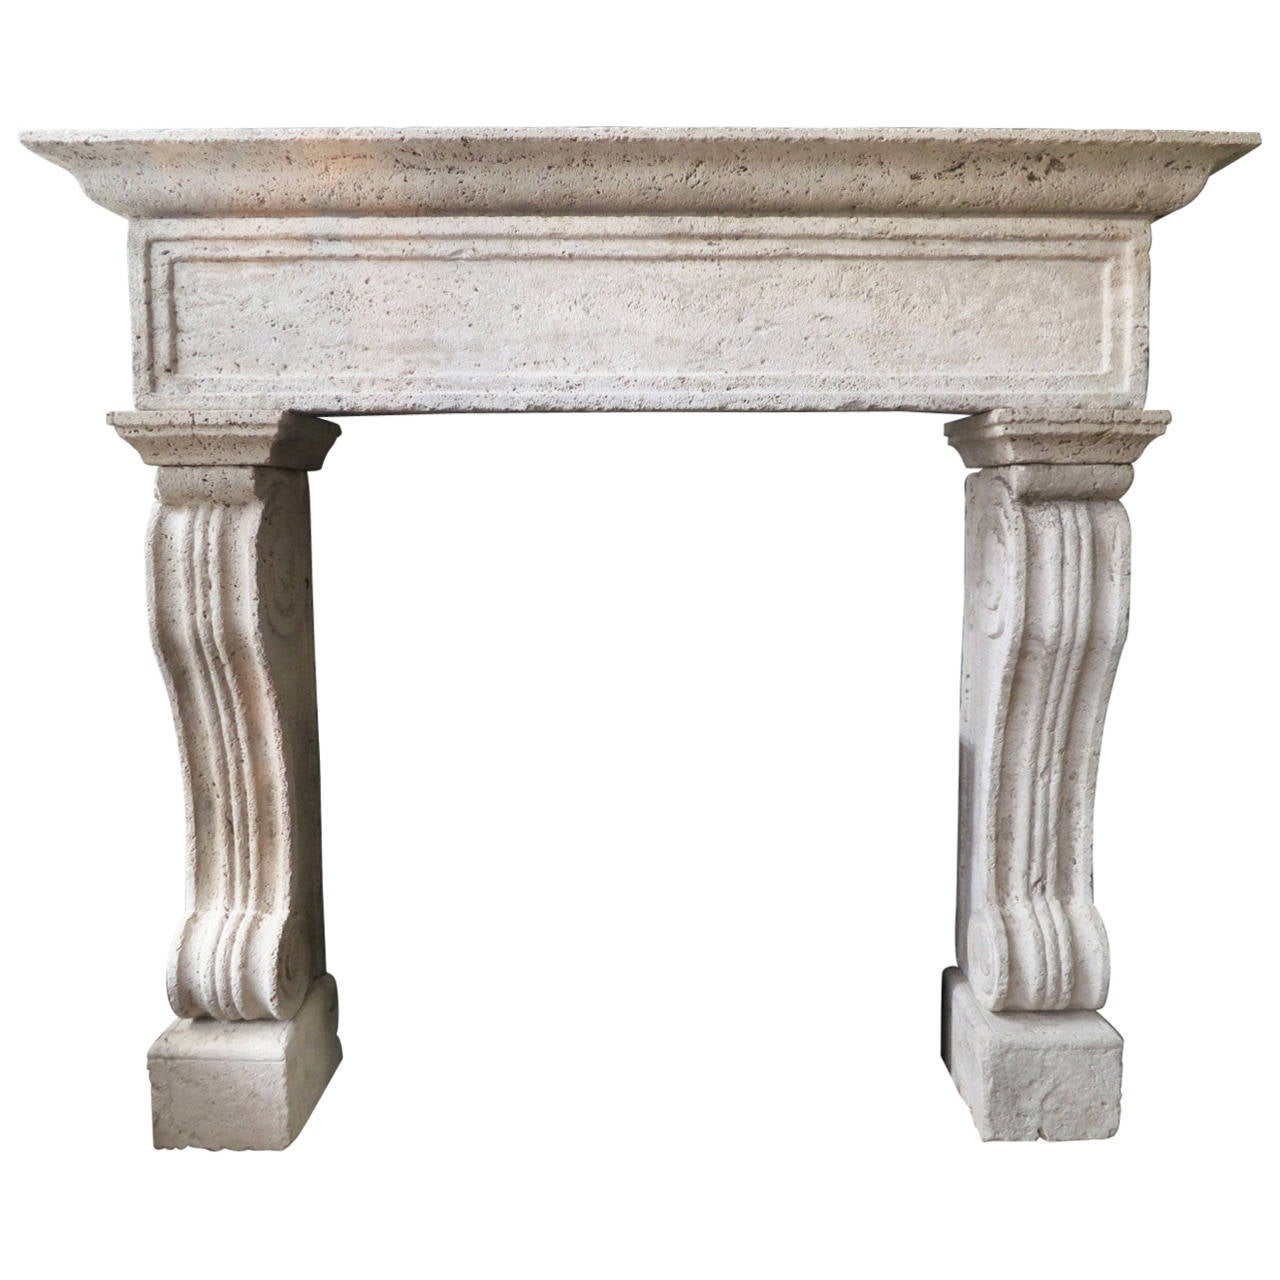 Italian Travertine Stone Fireplace Mantel at 1stdibs